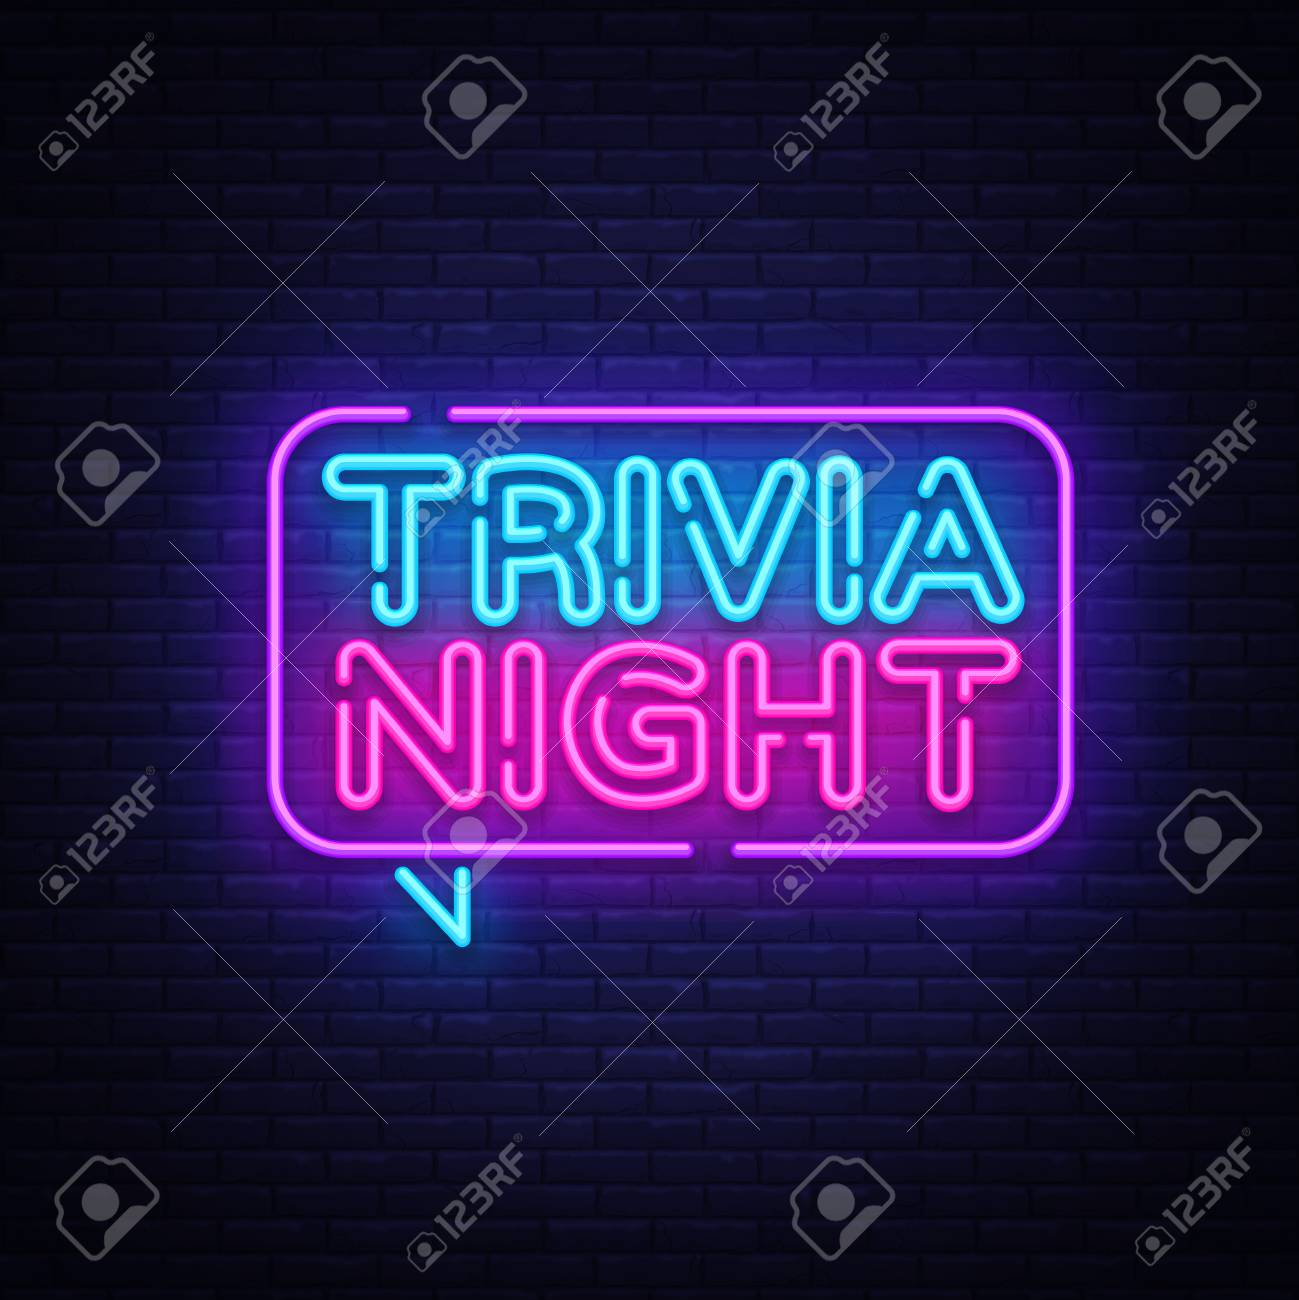 Trivia night announcement neon signboard vector. Light Banner, Design element, Night Neon Advensing. Vector illustration. - 103260263